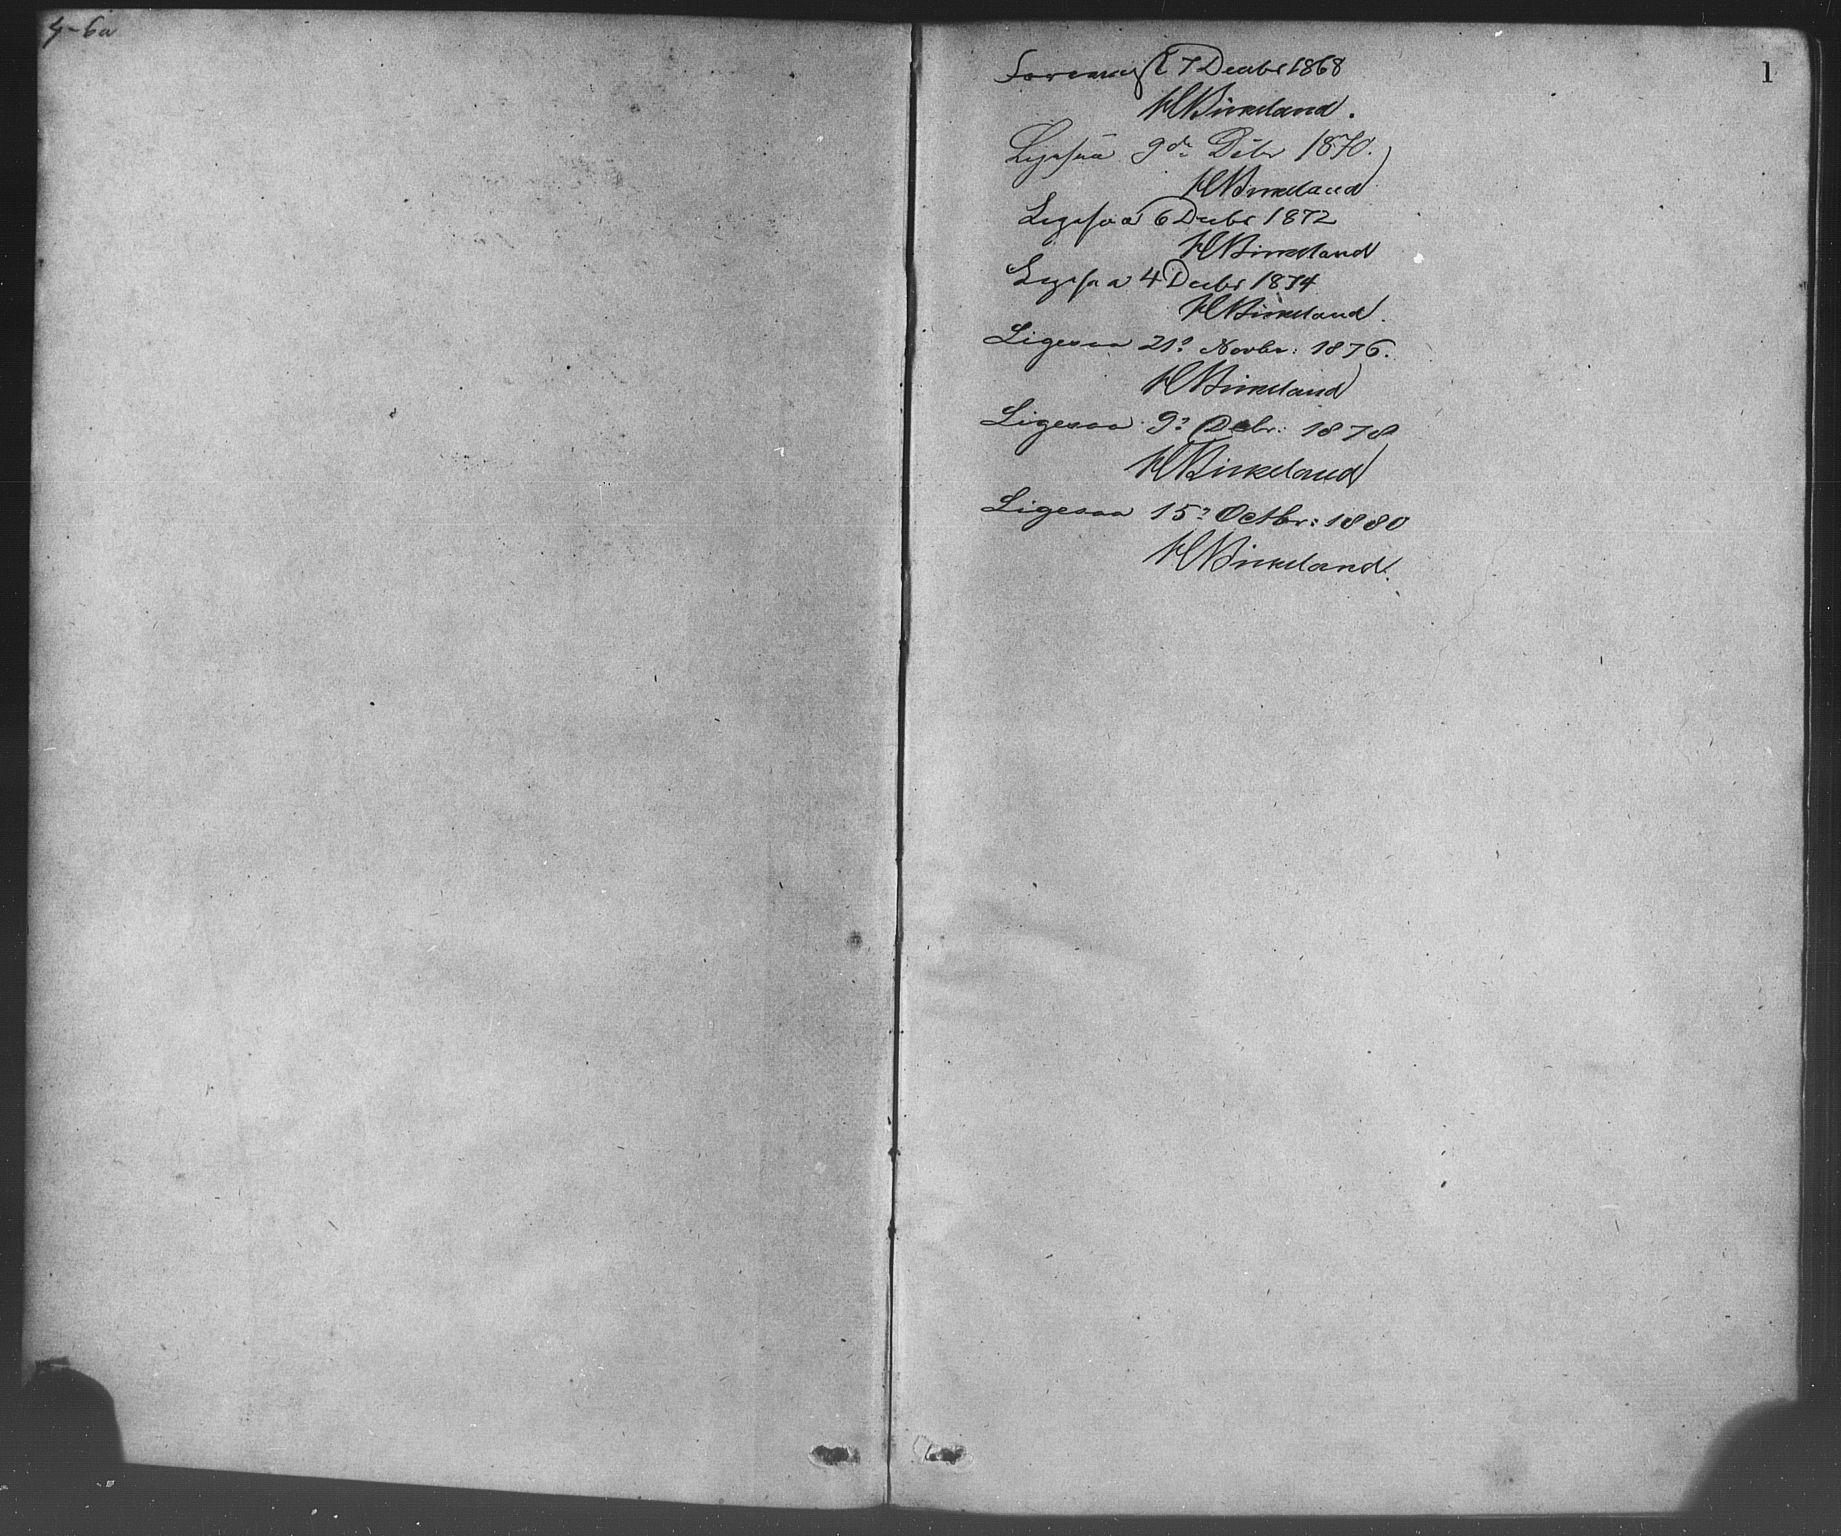 SAB, Korskirken Sokneprestembete, H/Haa/L0028: Ministerialbok nr. C 4, 1868-1879, s. 1